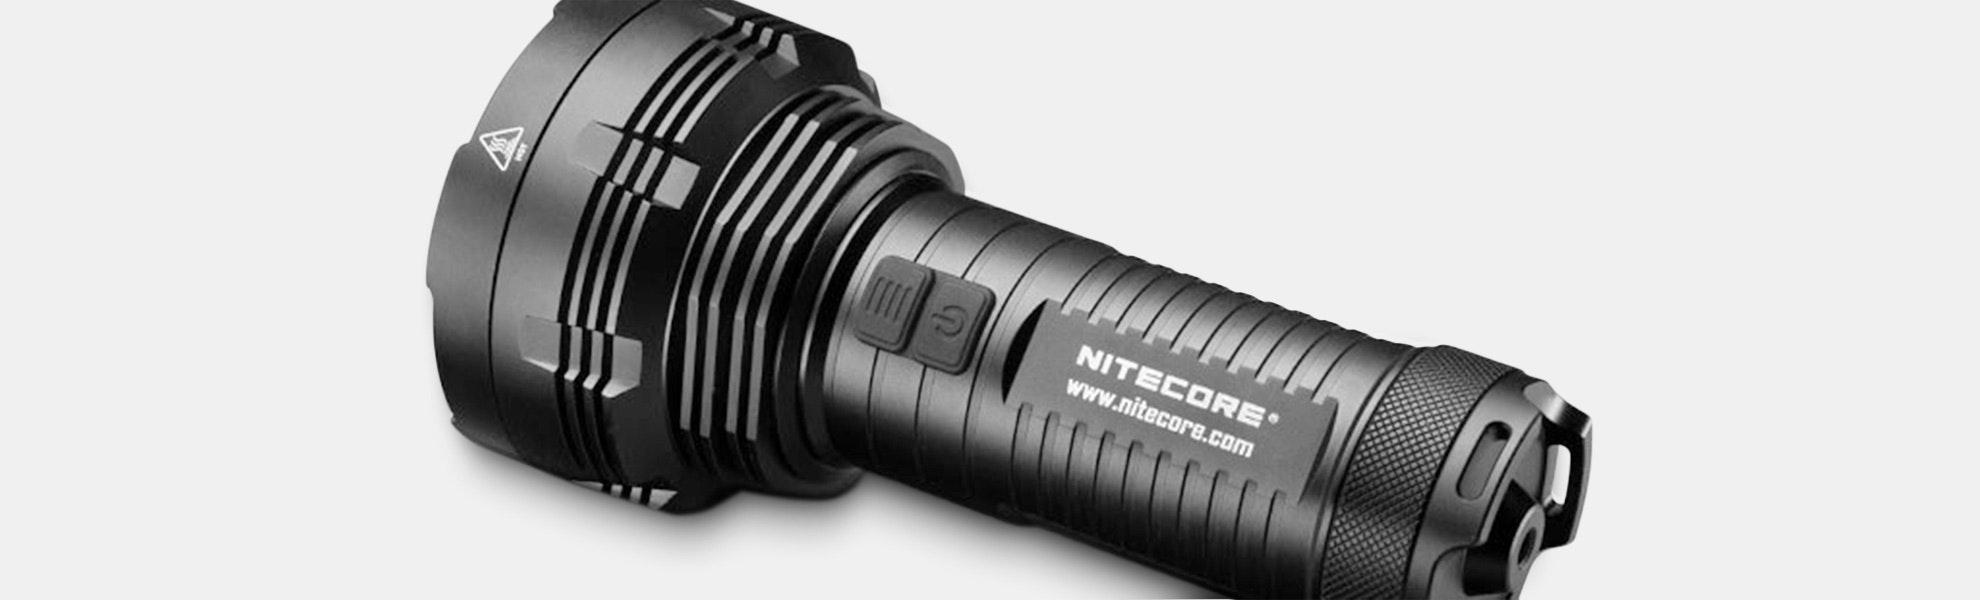 Nitecore Tiny Monster Flashlight - TM16